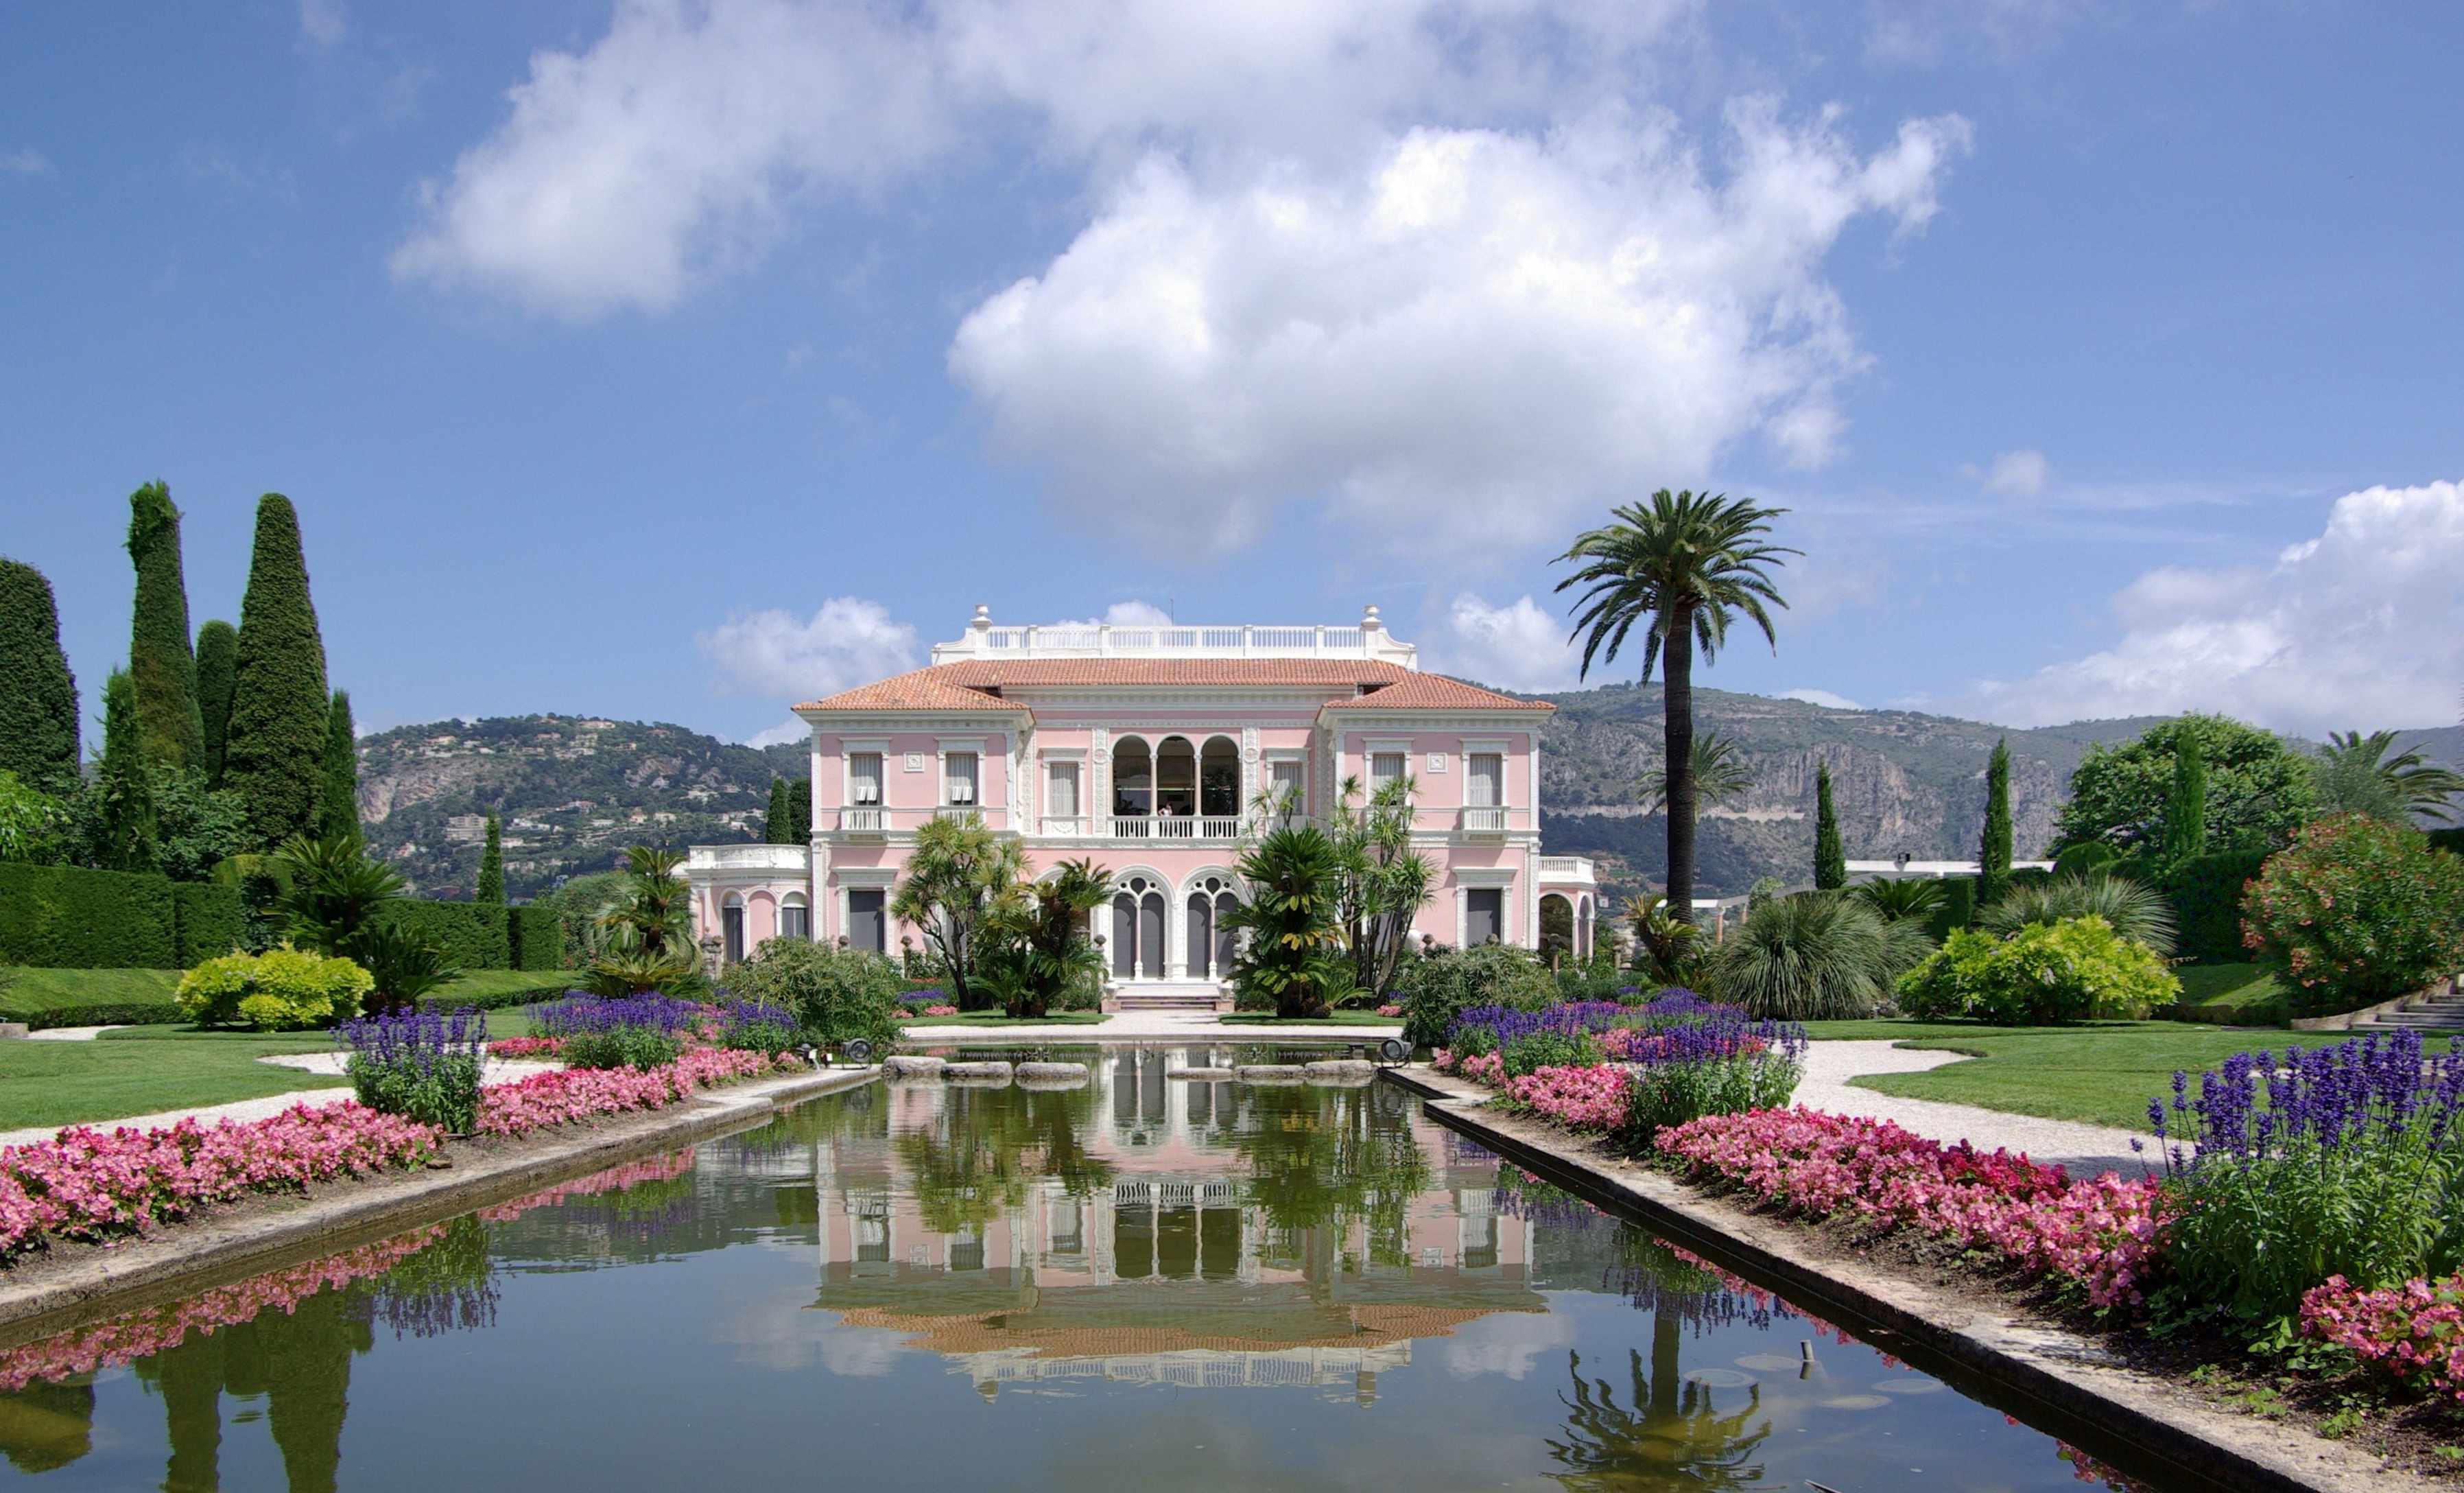 Villa Ephrussi de Rothschild - Wikipedia